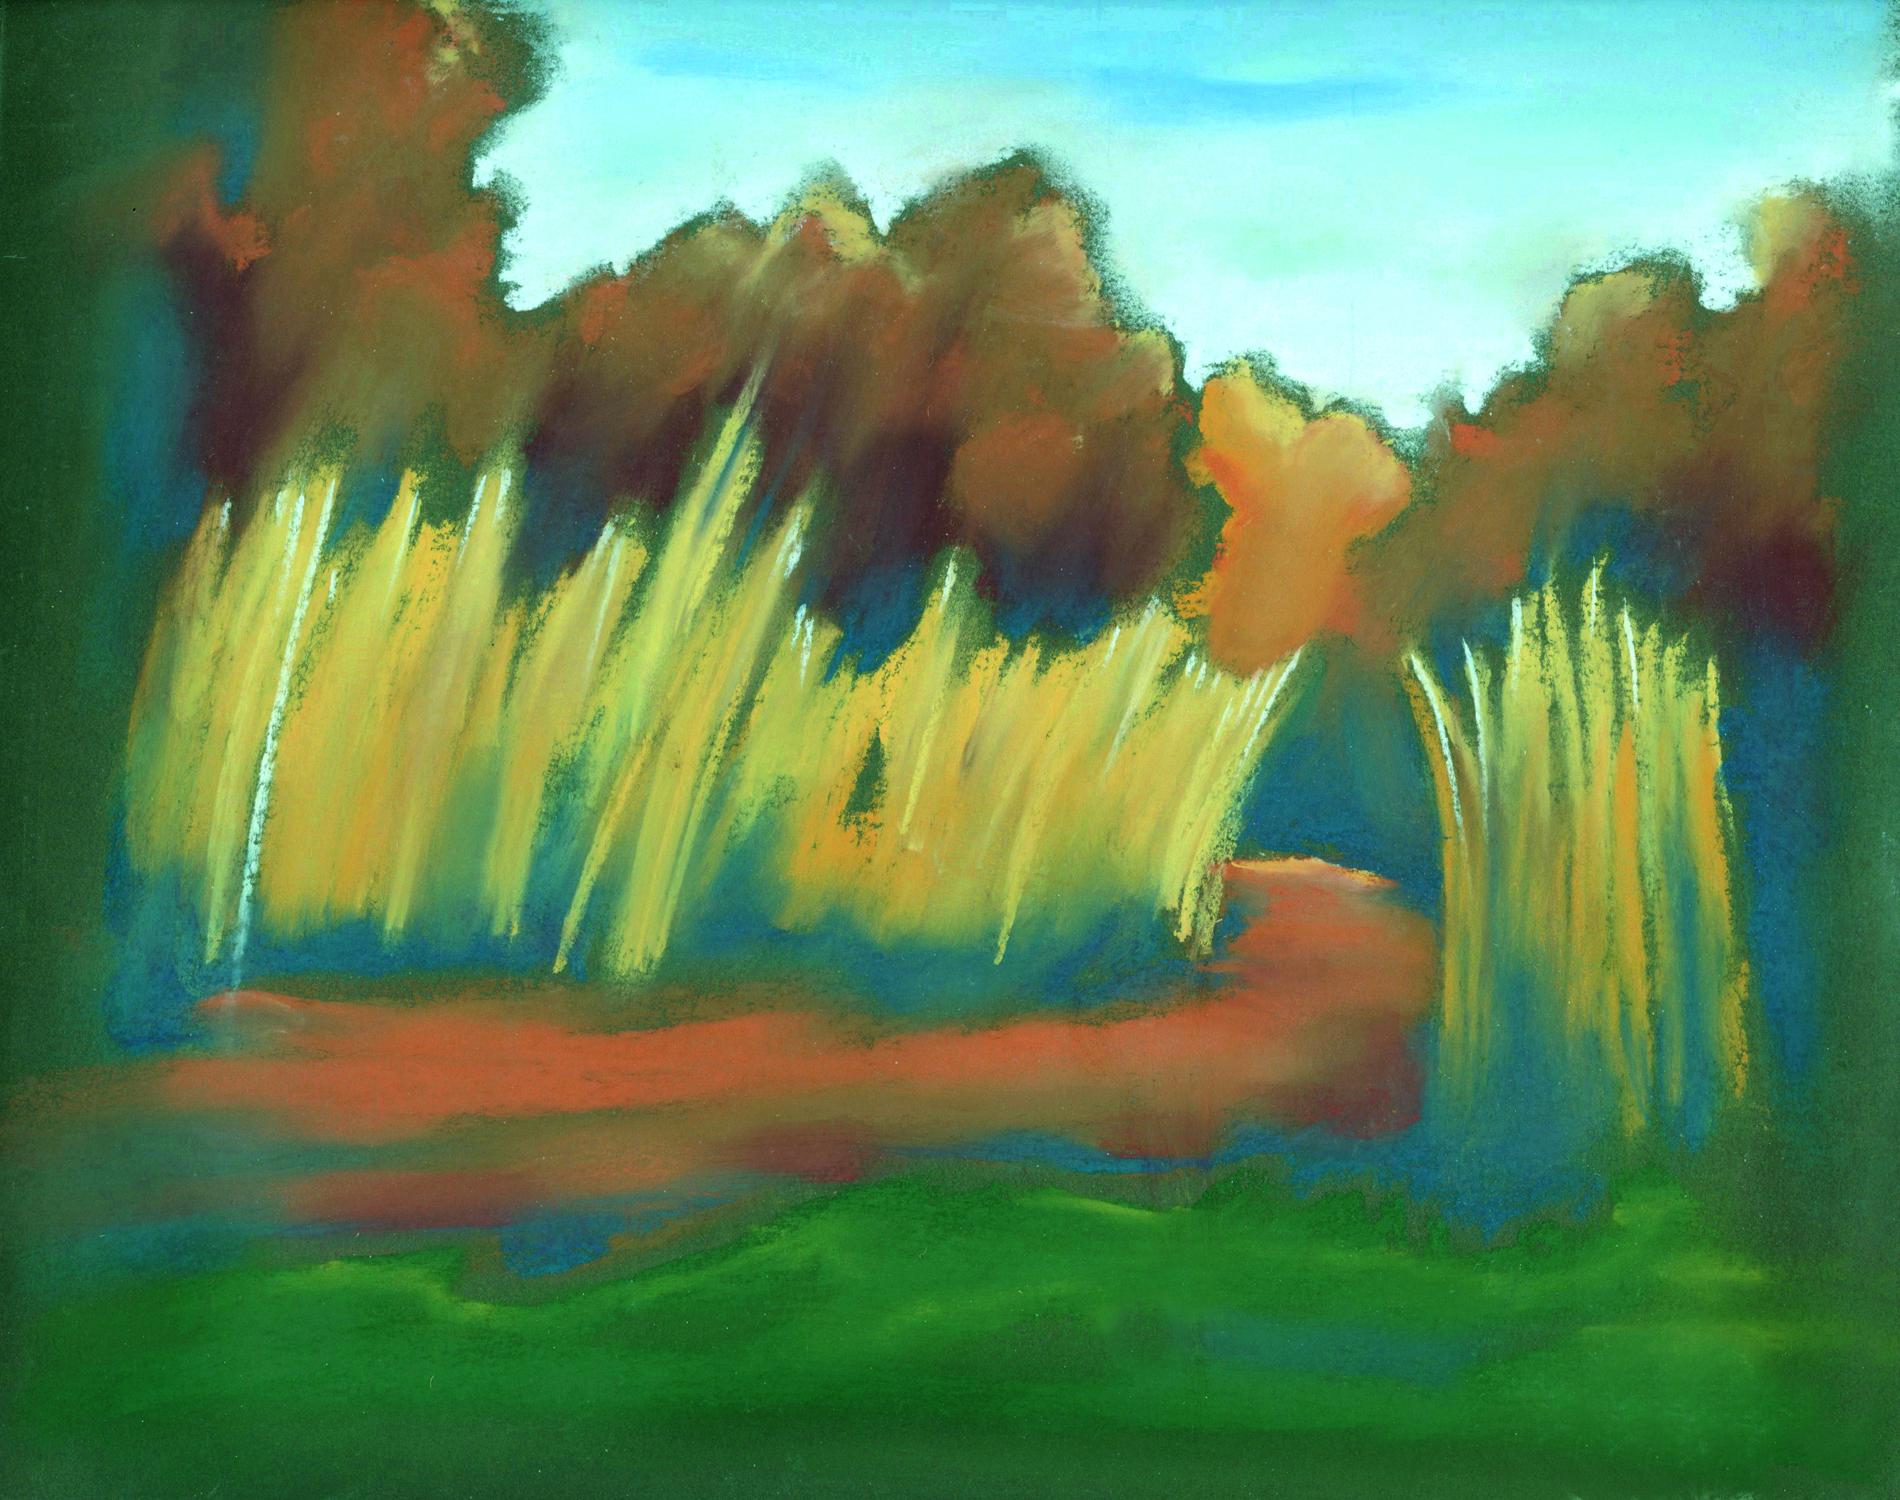 Grass Land : Autumn Impressions